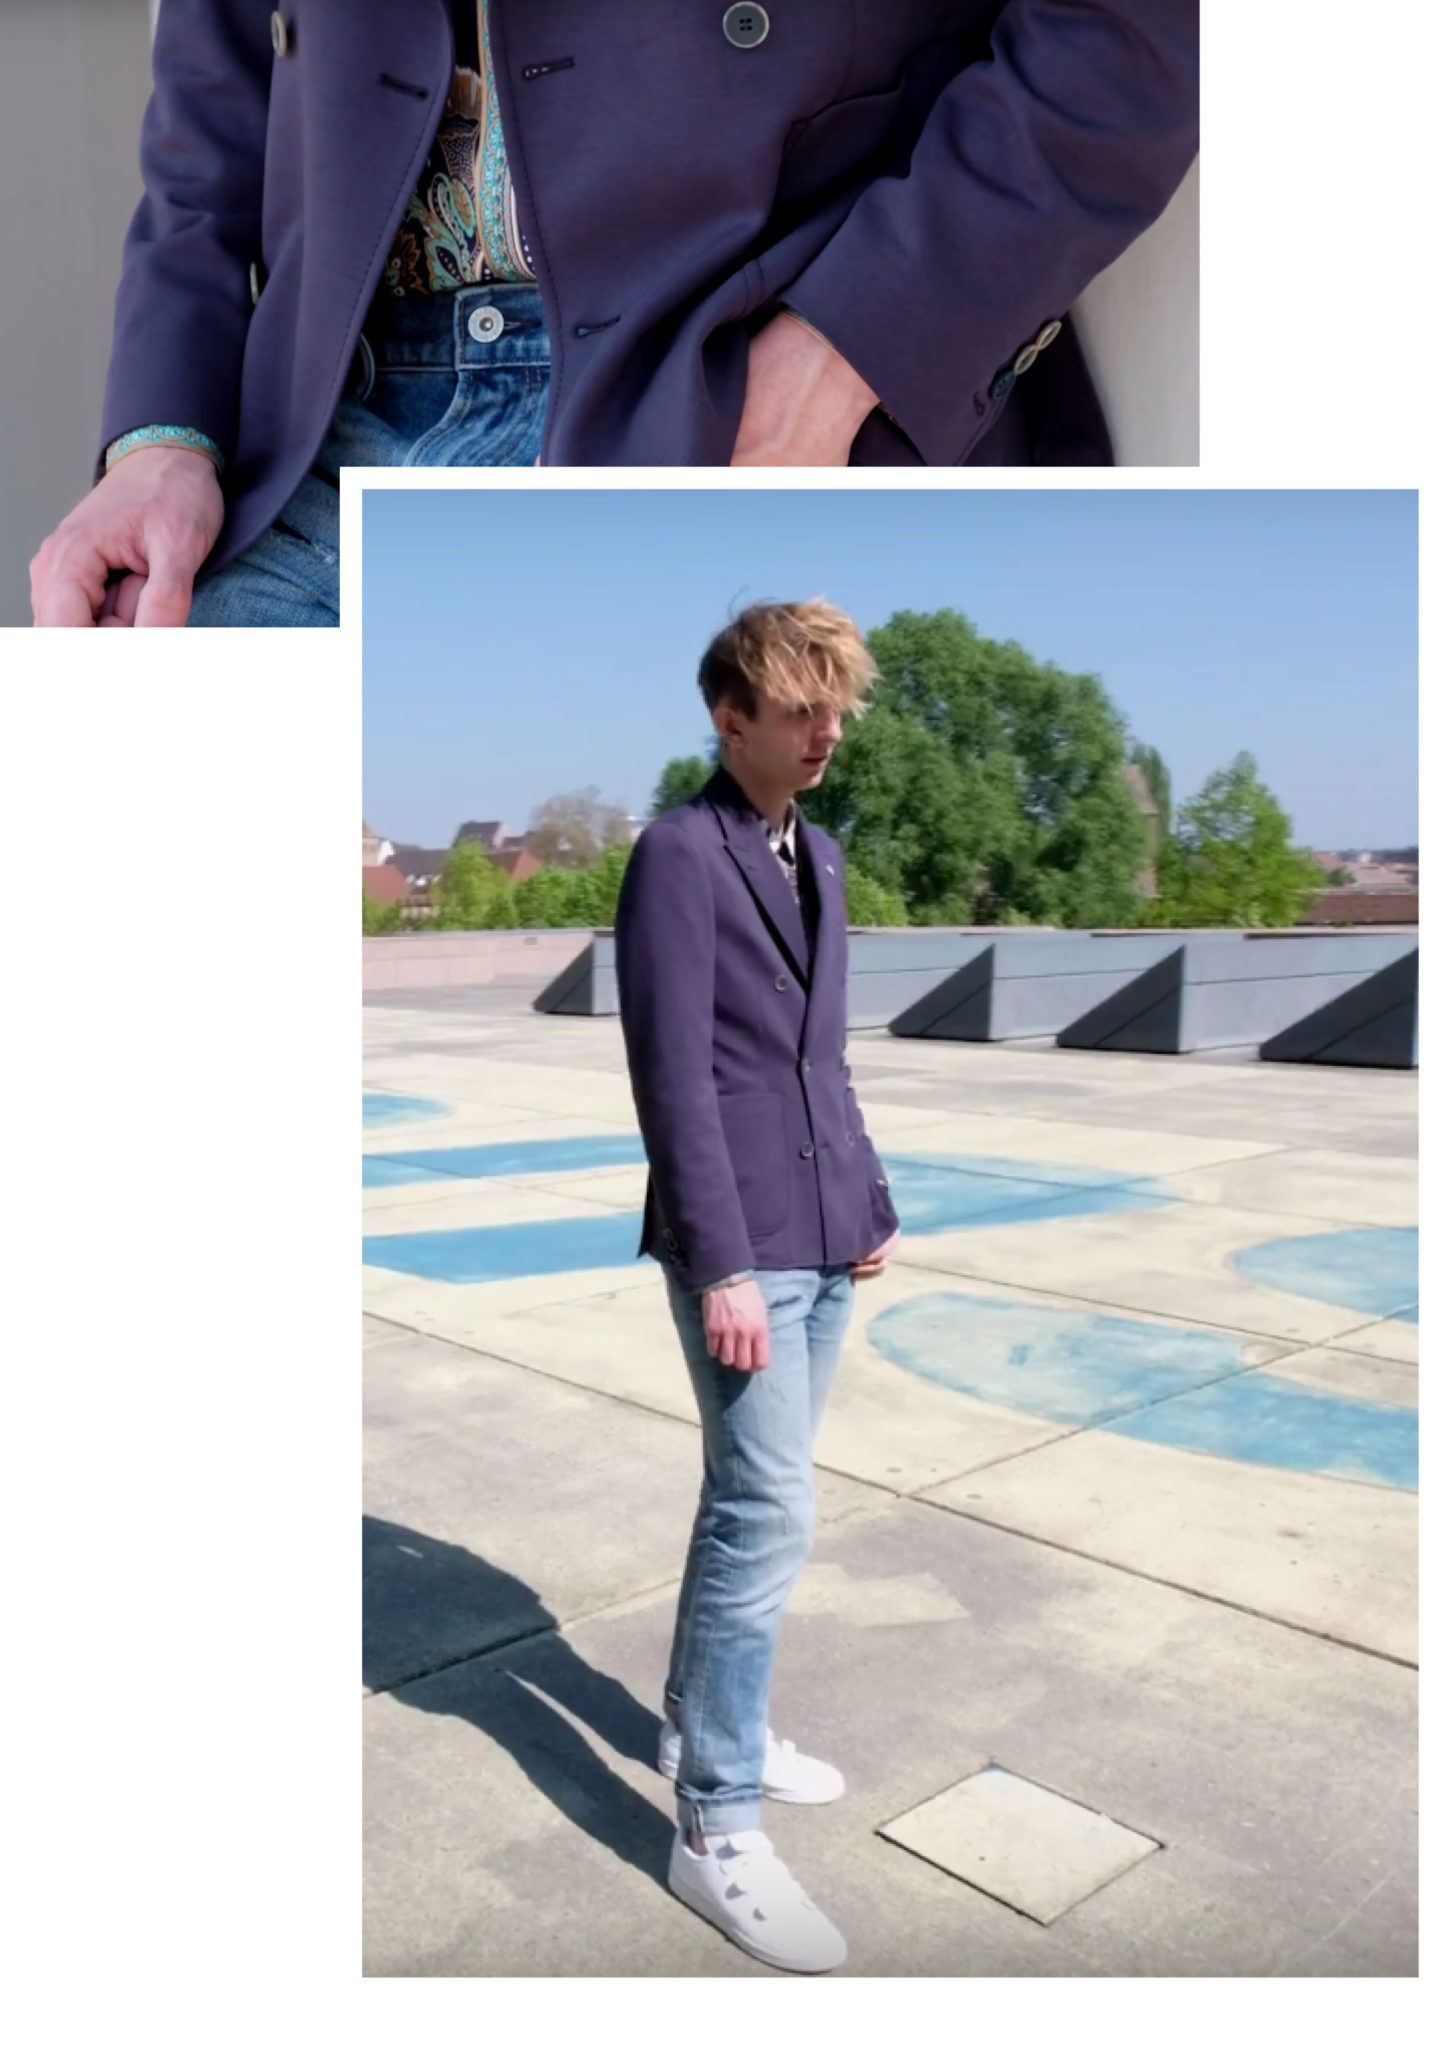 blog-mode-homme-strasbourg-maurice-style-moderniser-costume-galeries-lafayette3